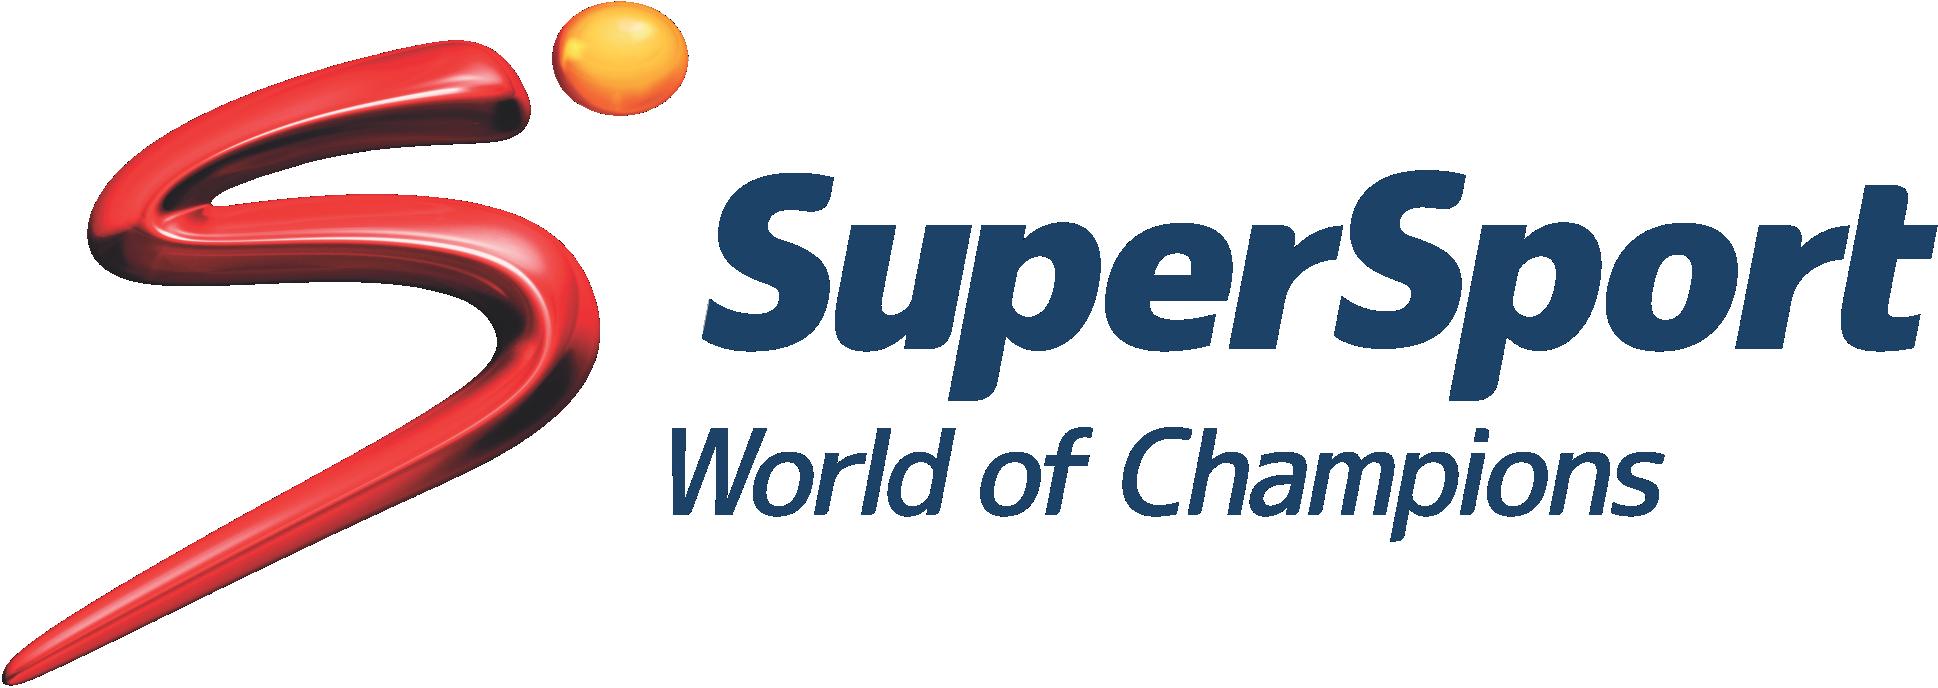 SuperSport : Brand Short Description Type Here.